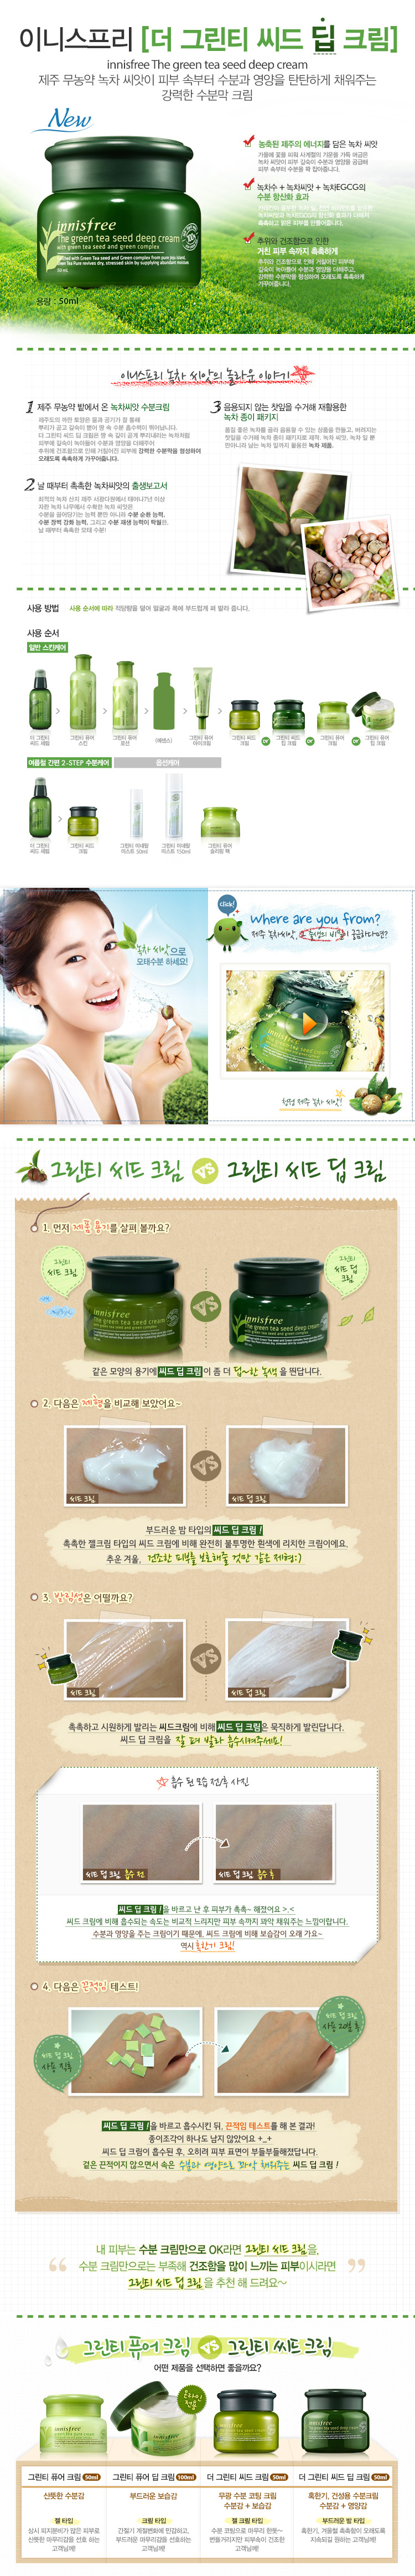 Innisfree - The Green Tea Seed Deep Cream